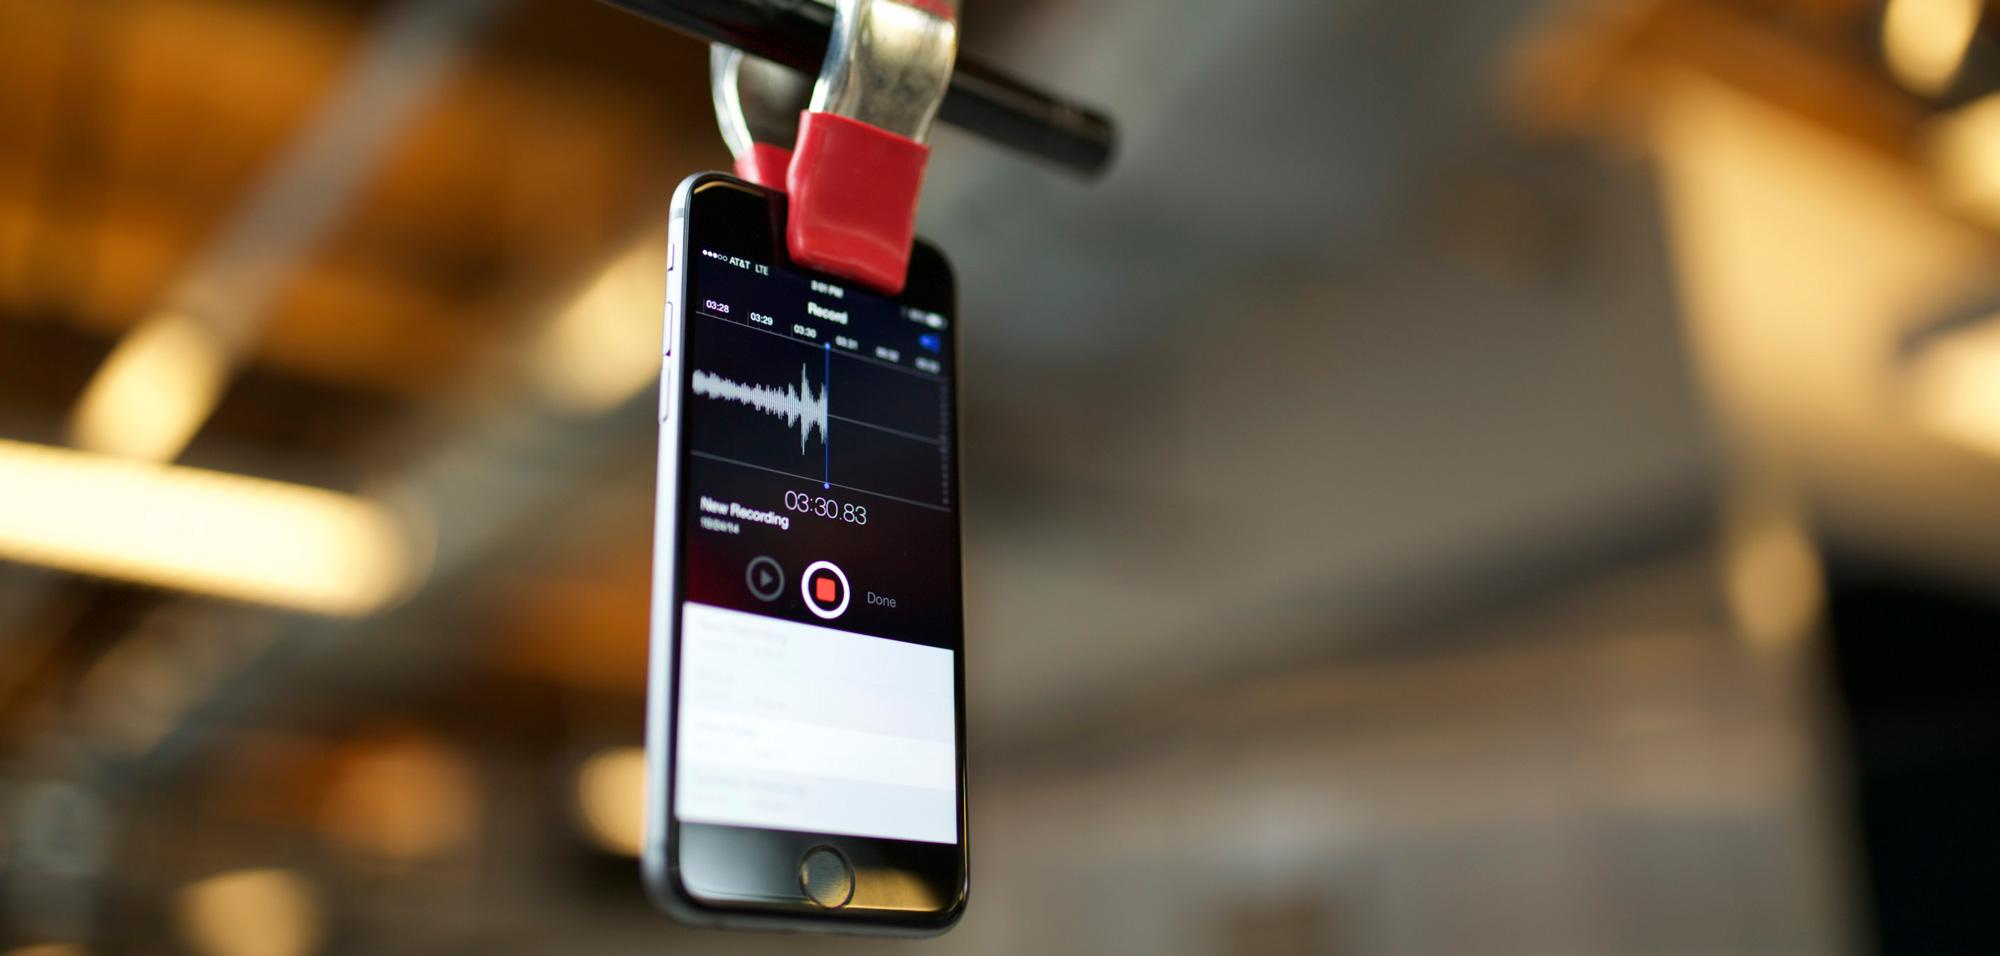 Podcast recording on iPhone, Photo via /wistia.com